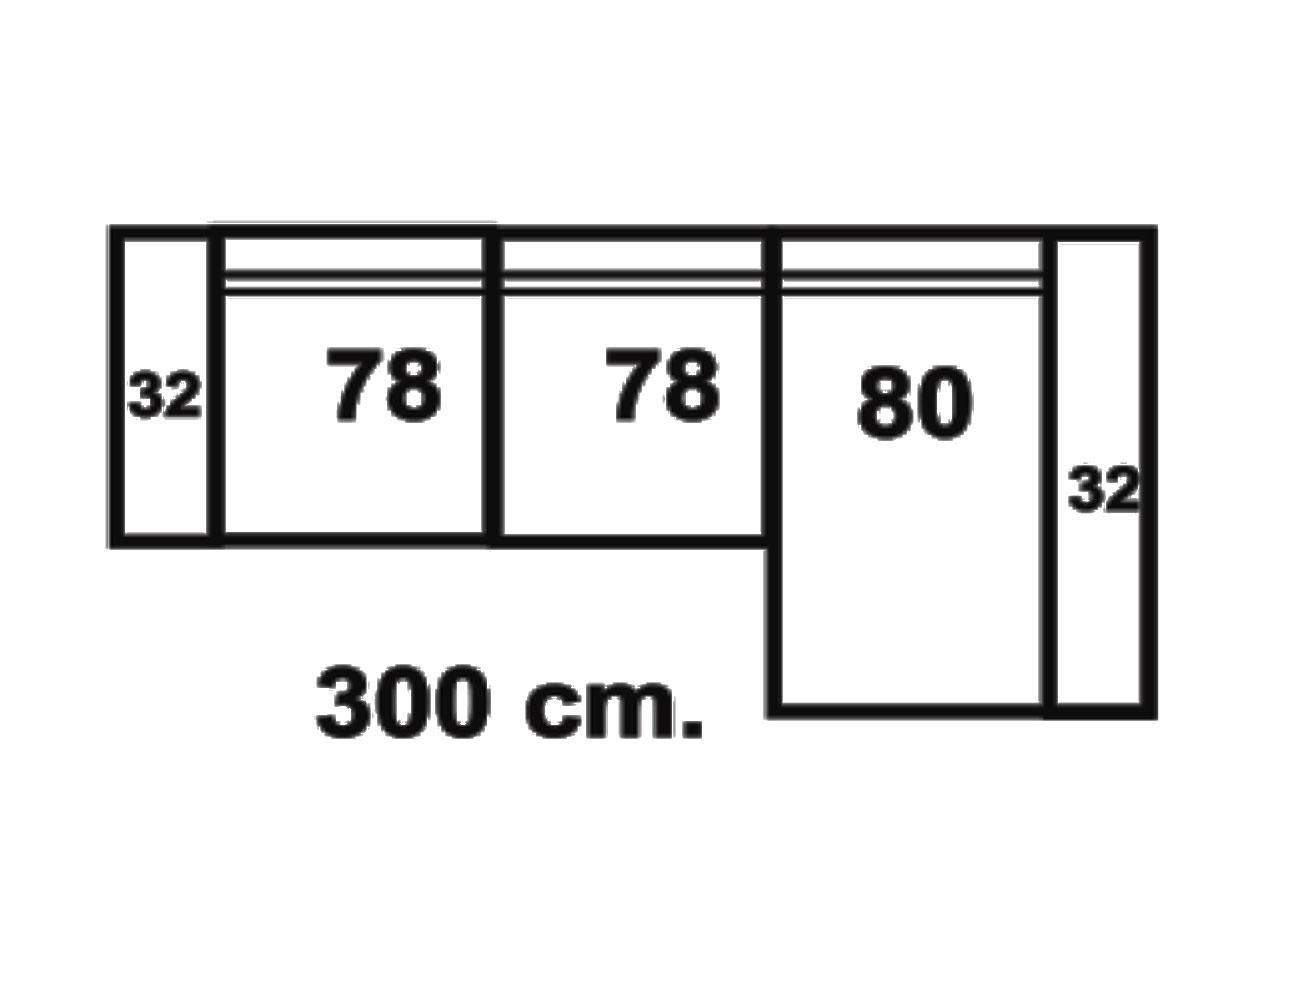 Sofa chaiselongue 300